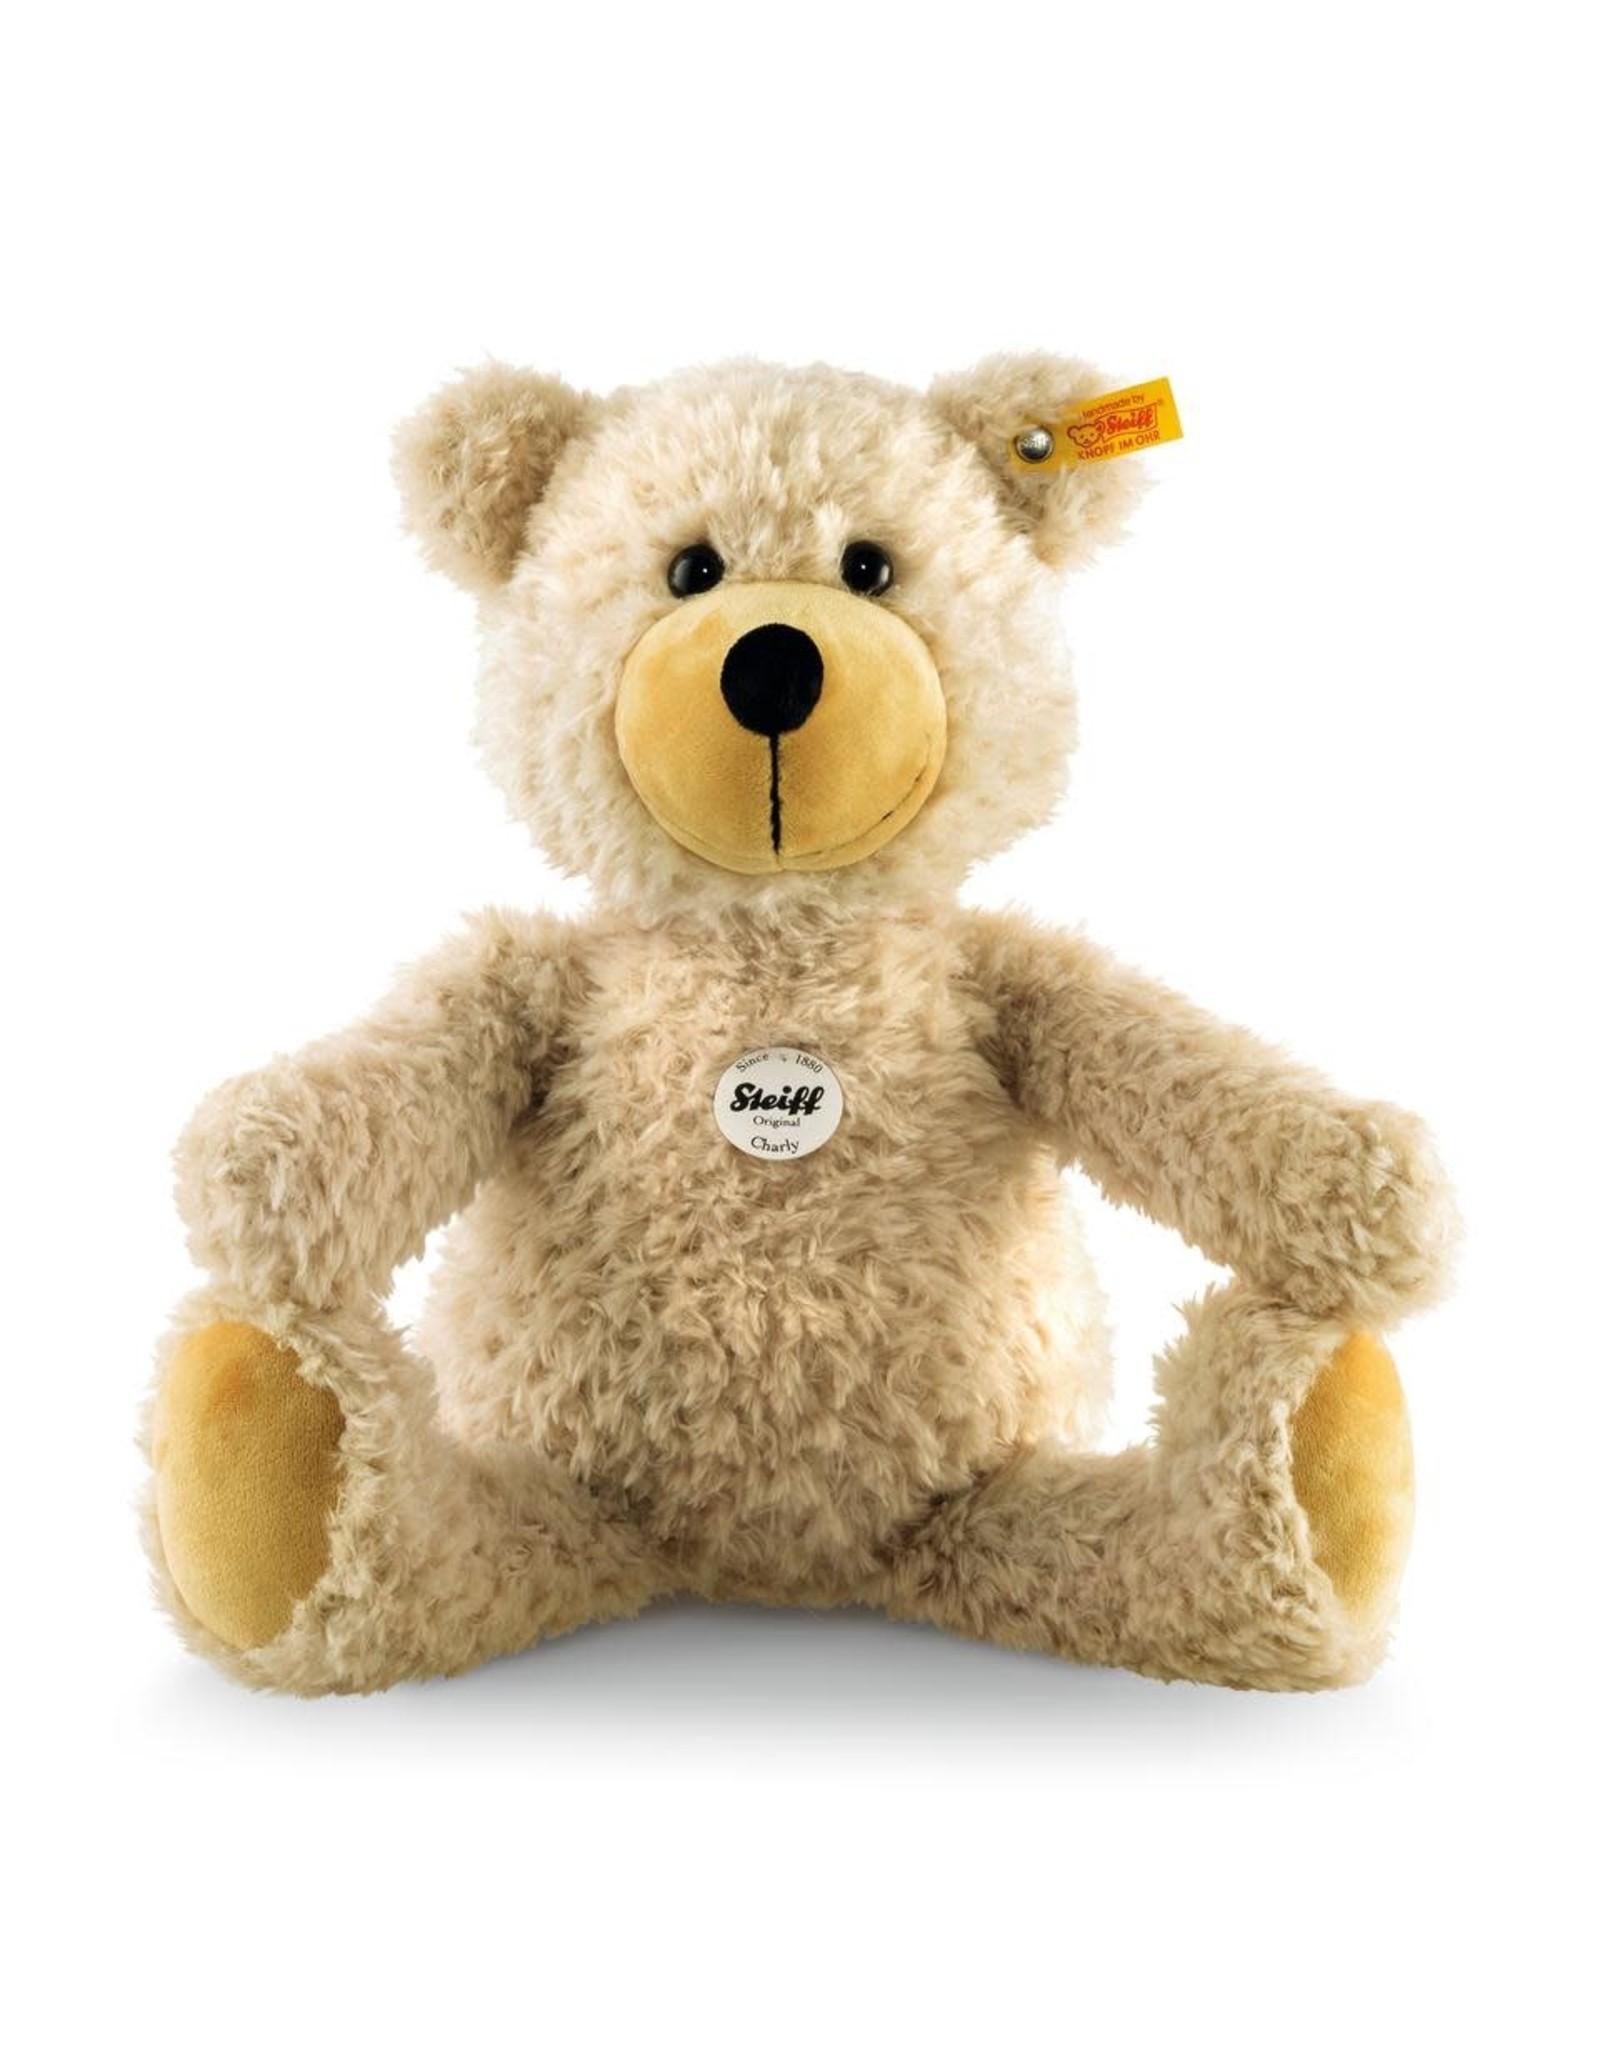 Steiff Charly Teddy Beige - Steiff 012853